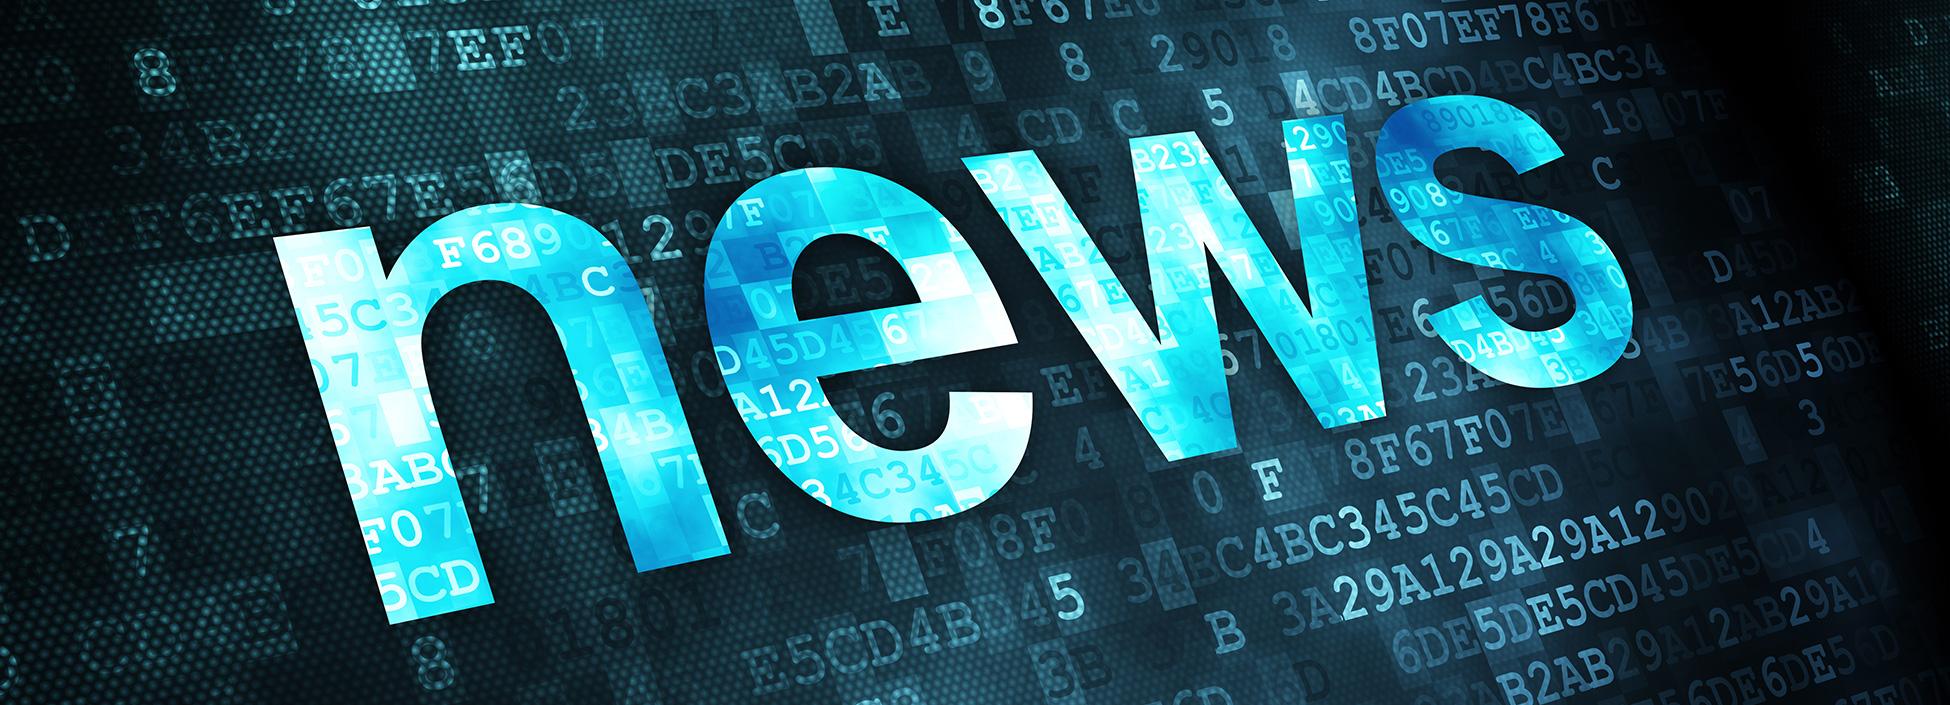 news - metropolitana di napoli